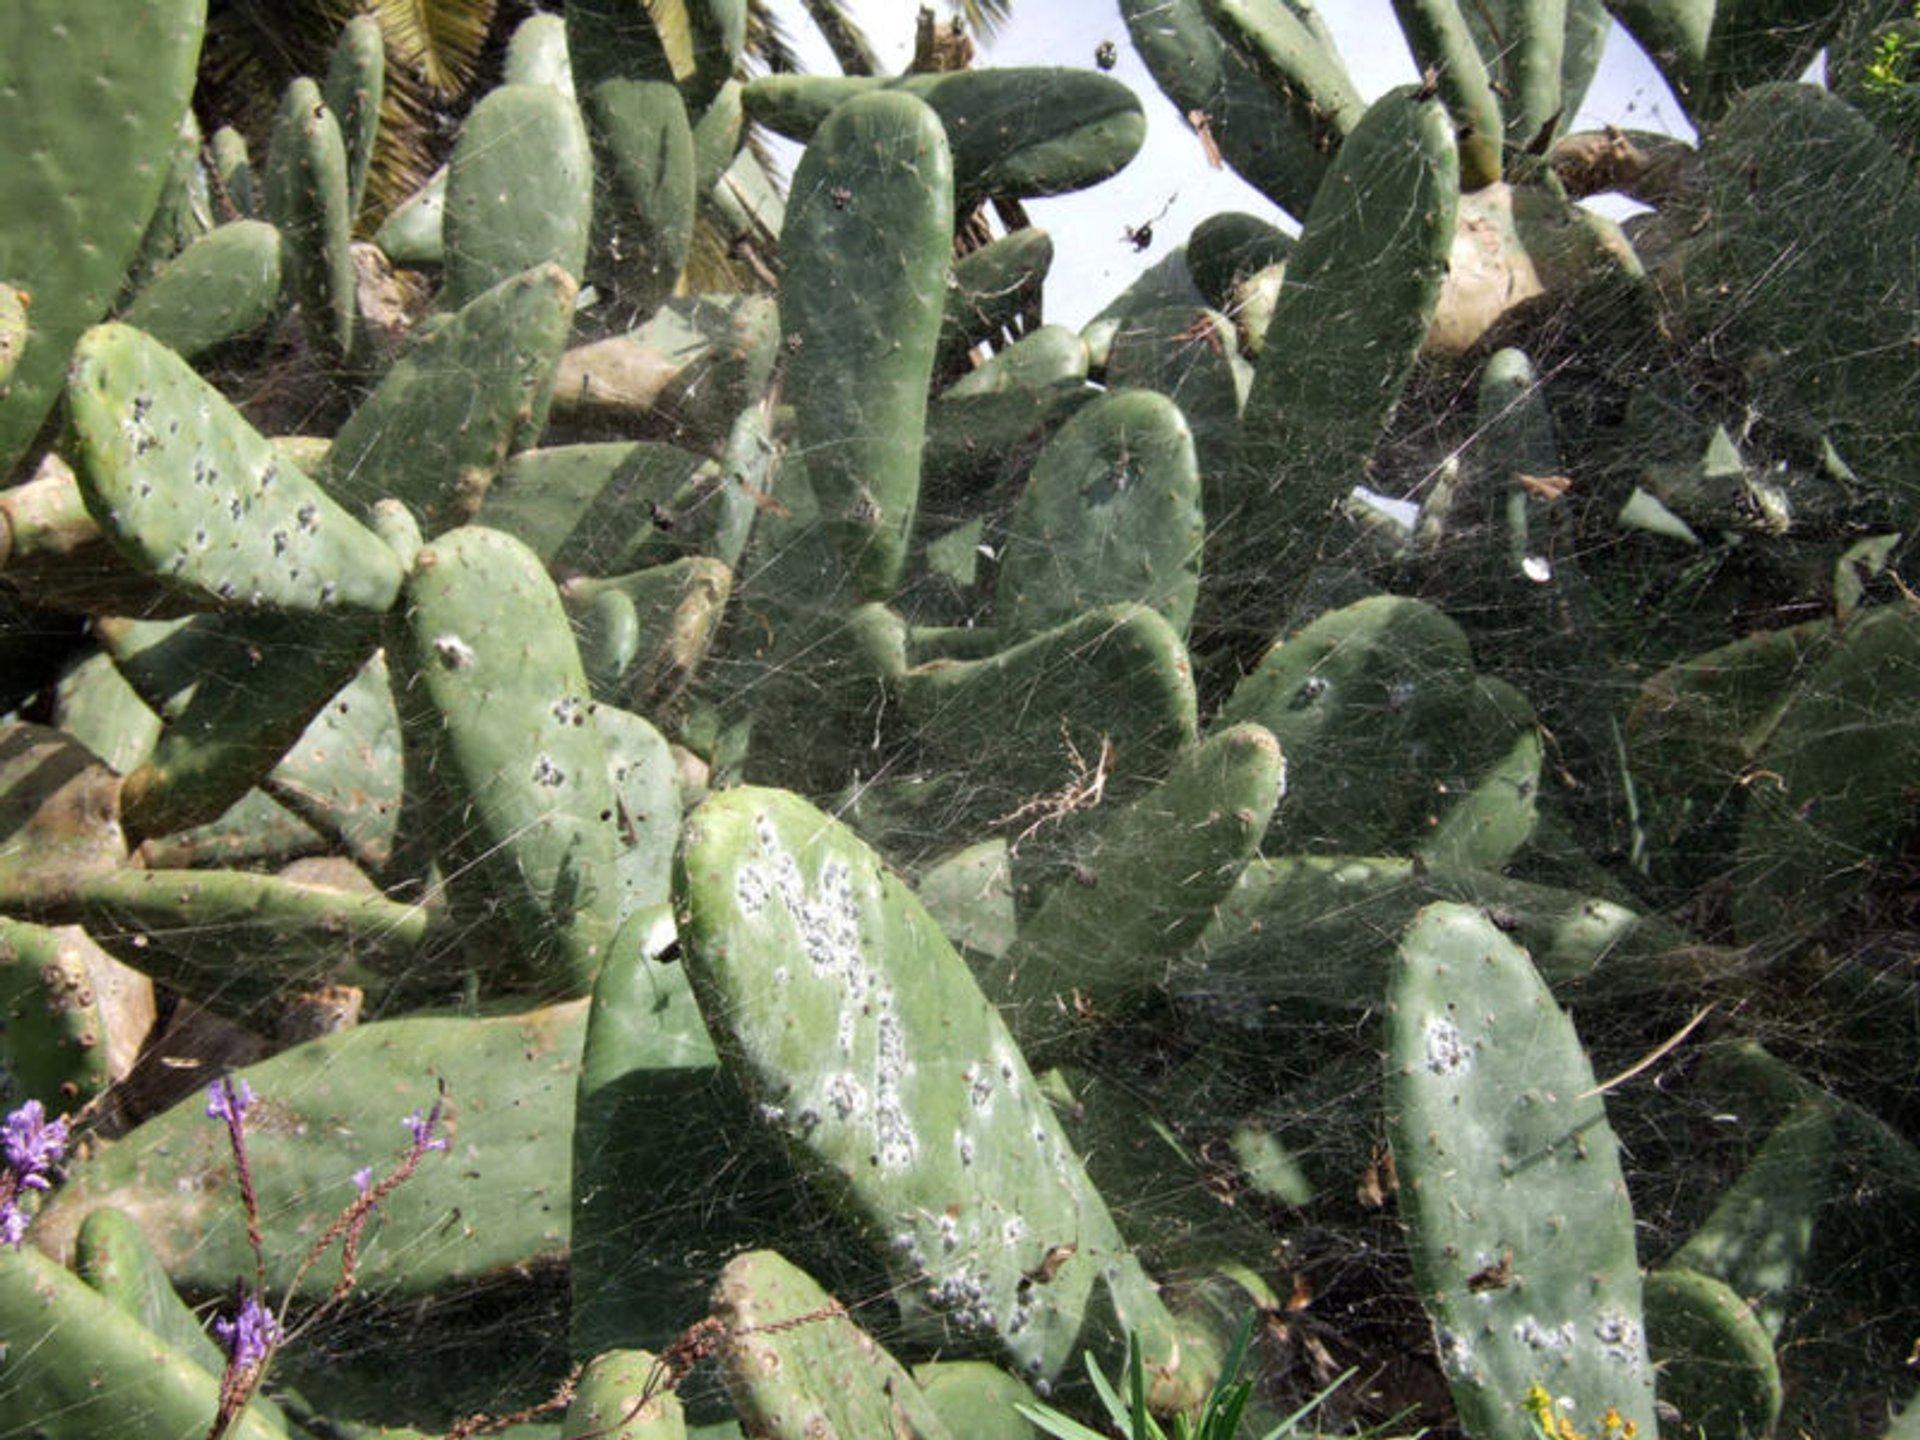 Cochineal on Opuntia cactus, La Palma 2020